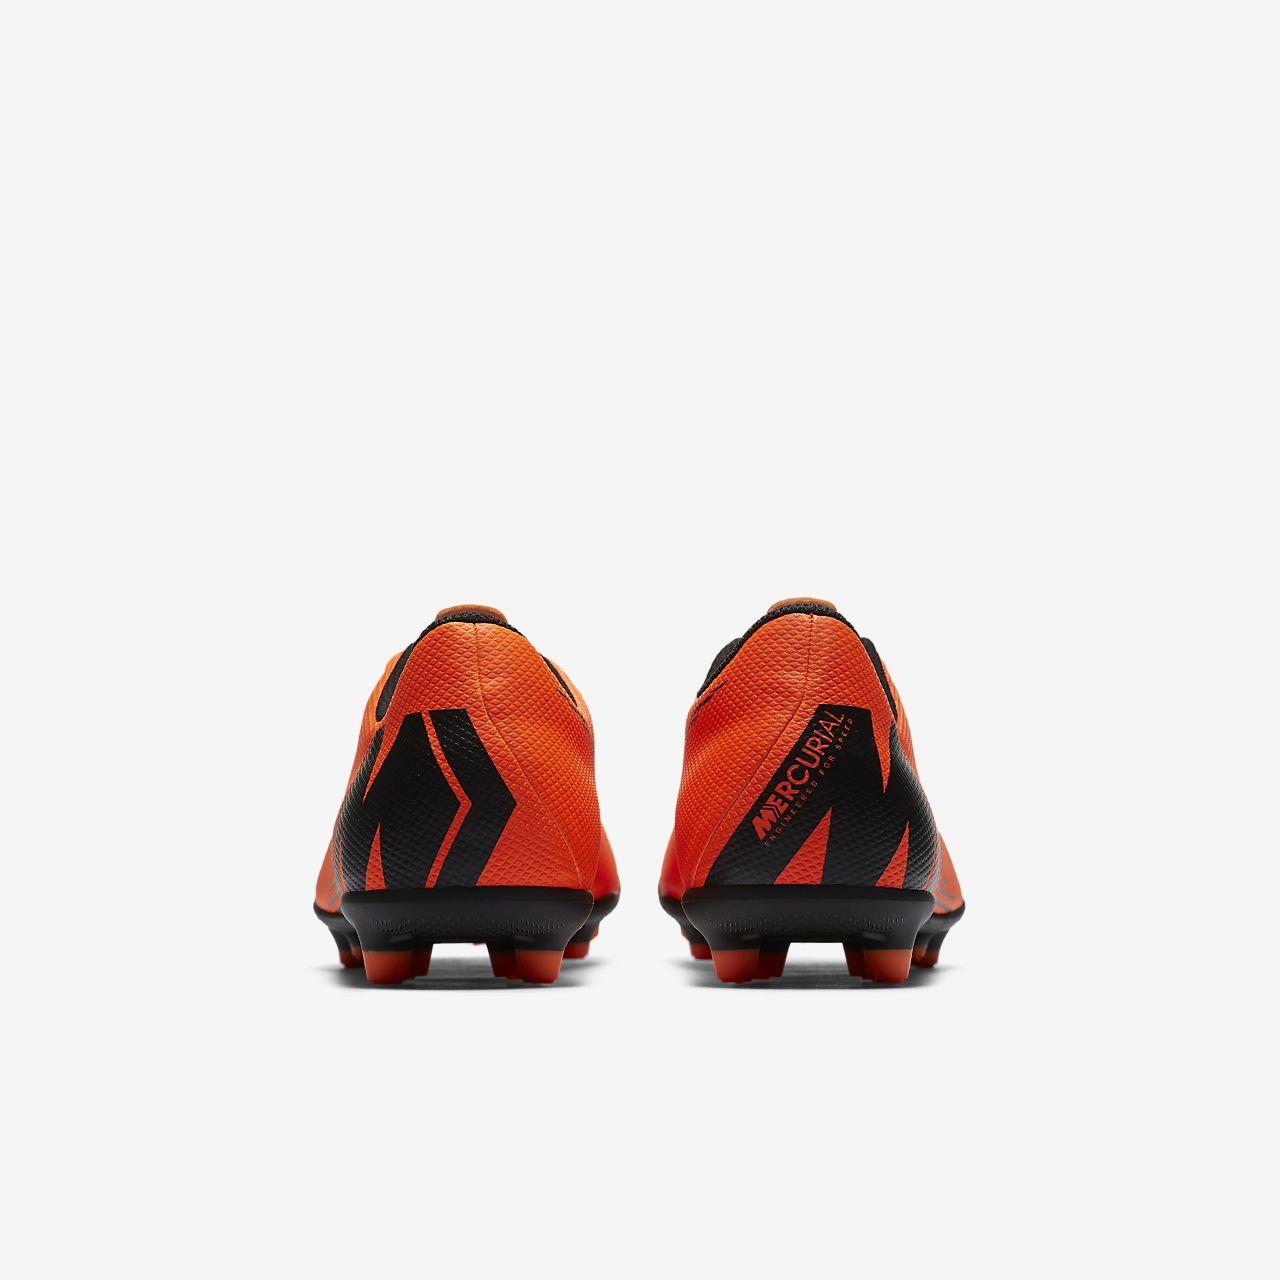 6a1a3b8fa ... Nike Jr. Mercurial Vapor XII Club Younger Older Kids  Multi-Ground  Football